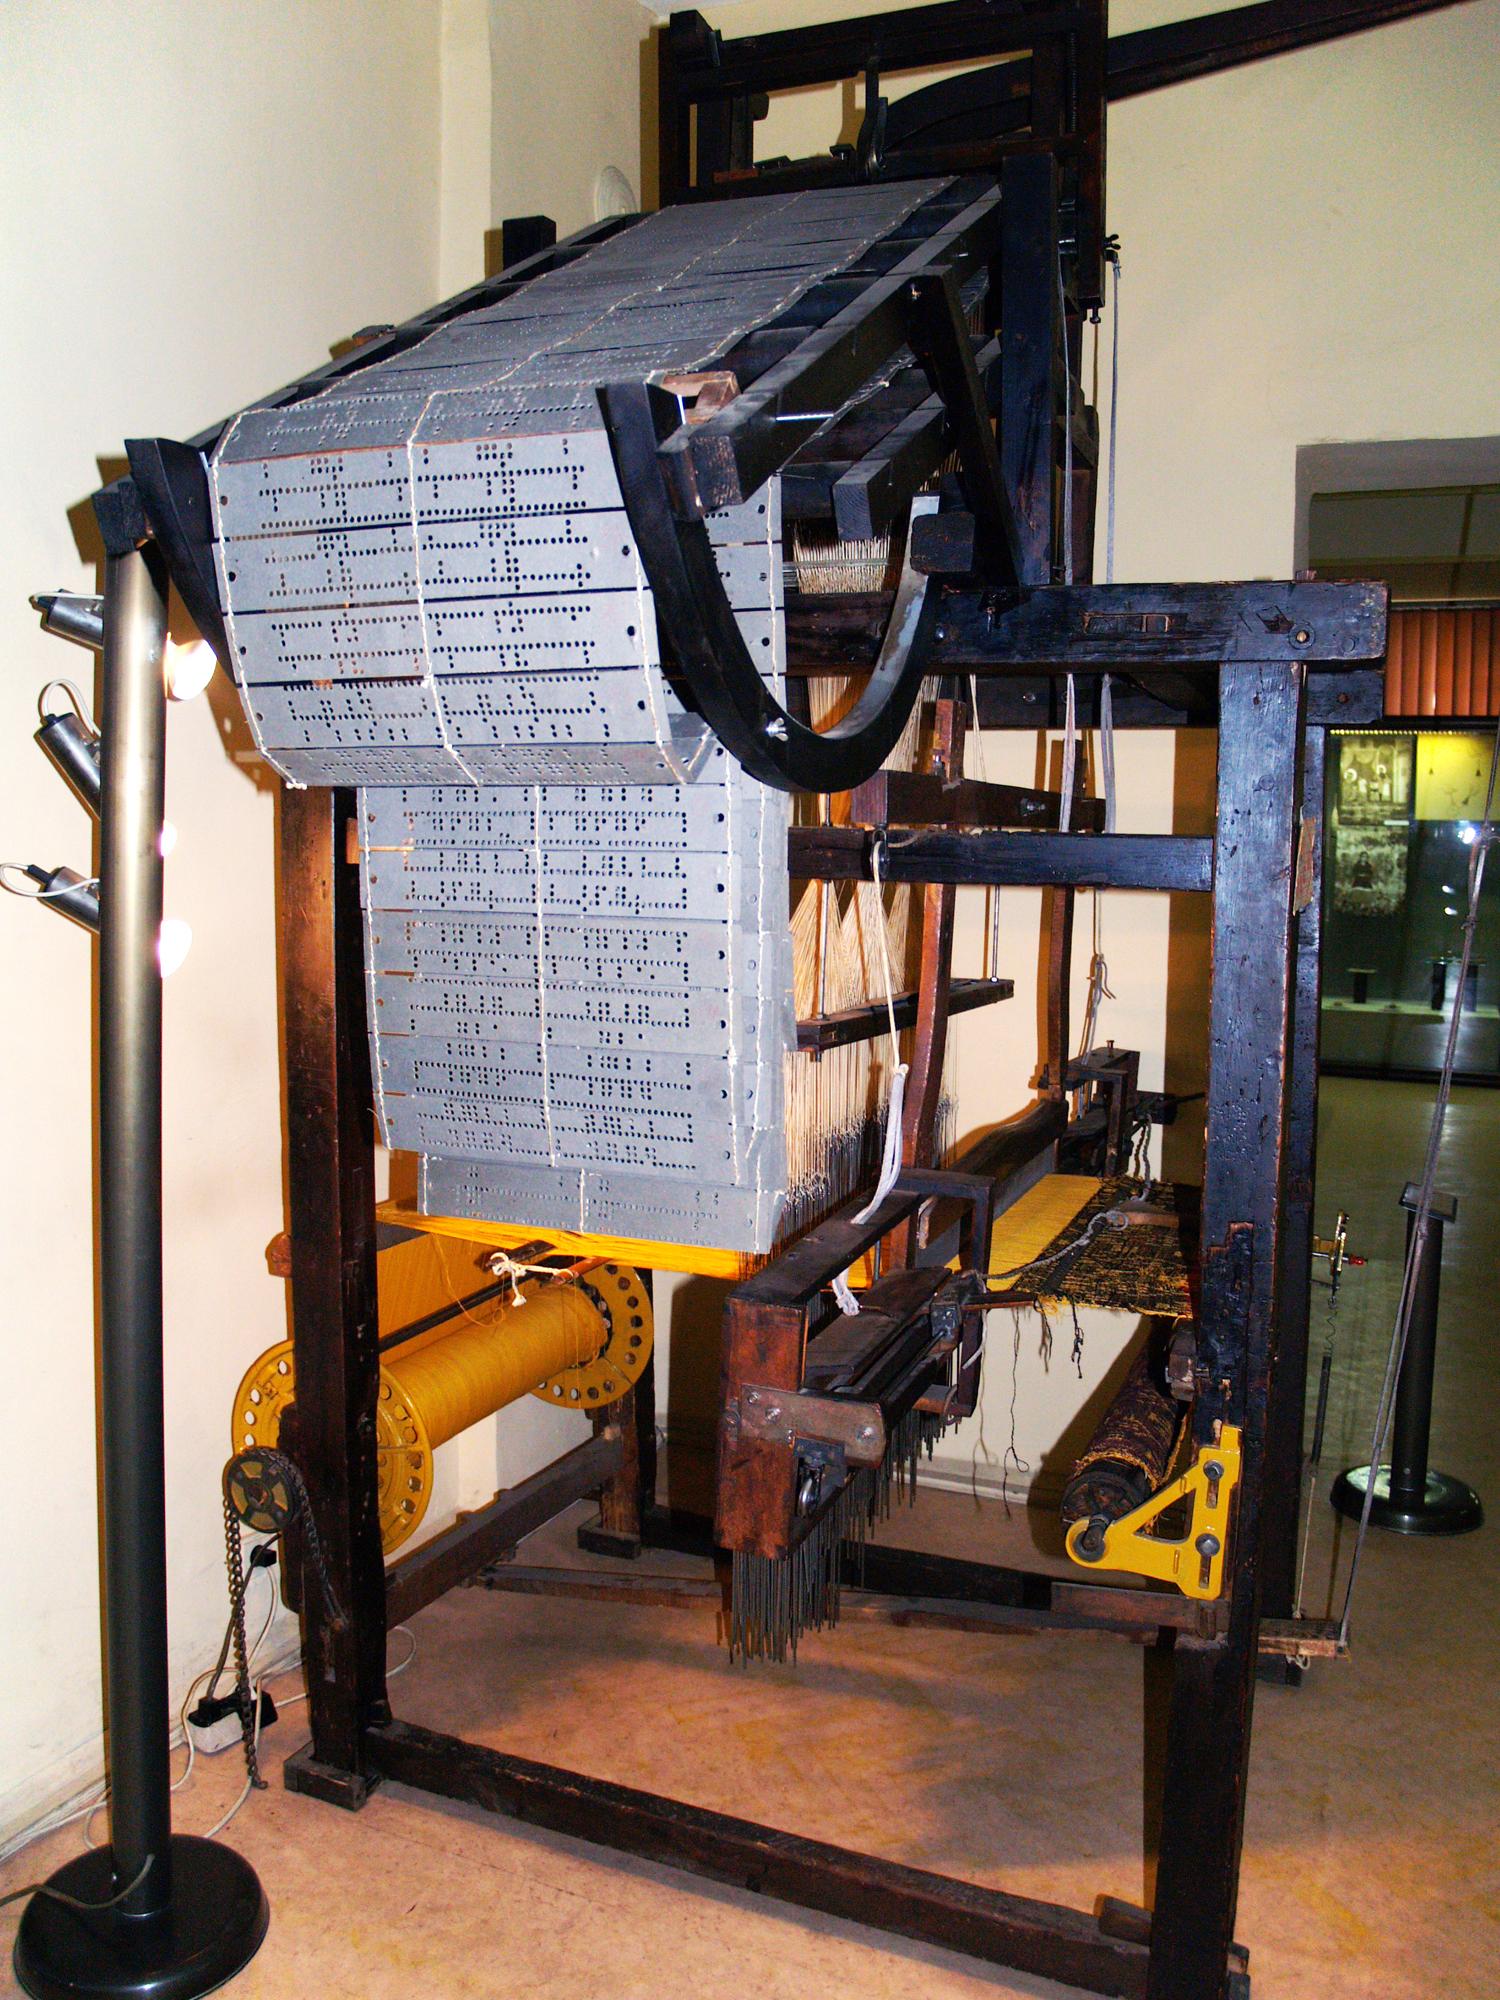 File:Hand-driven-jacquard-loom.jpg - Wikipedia, the free encyclopedia